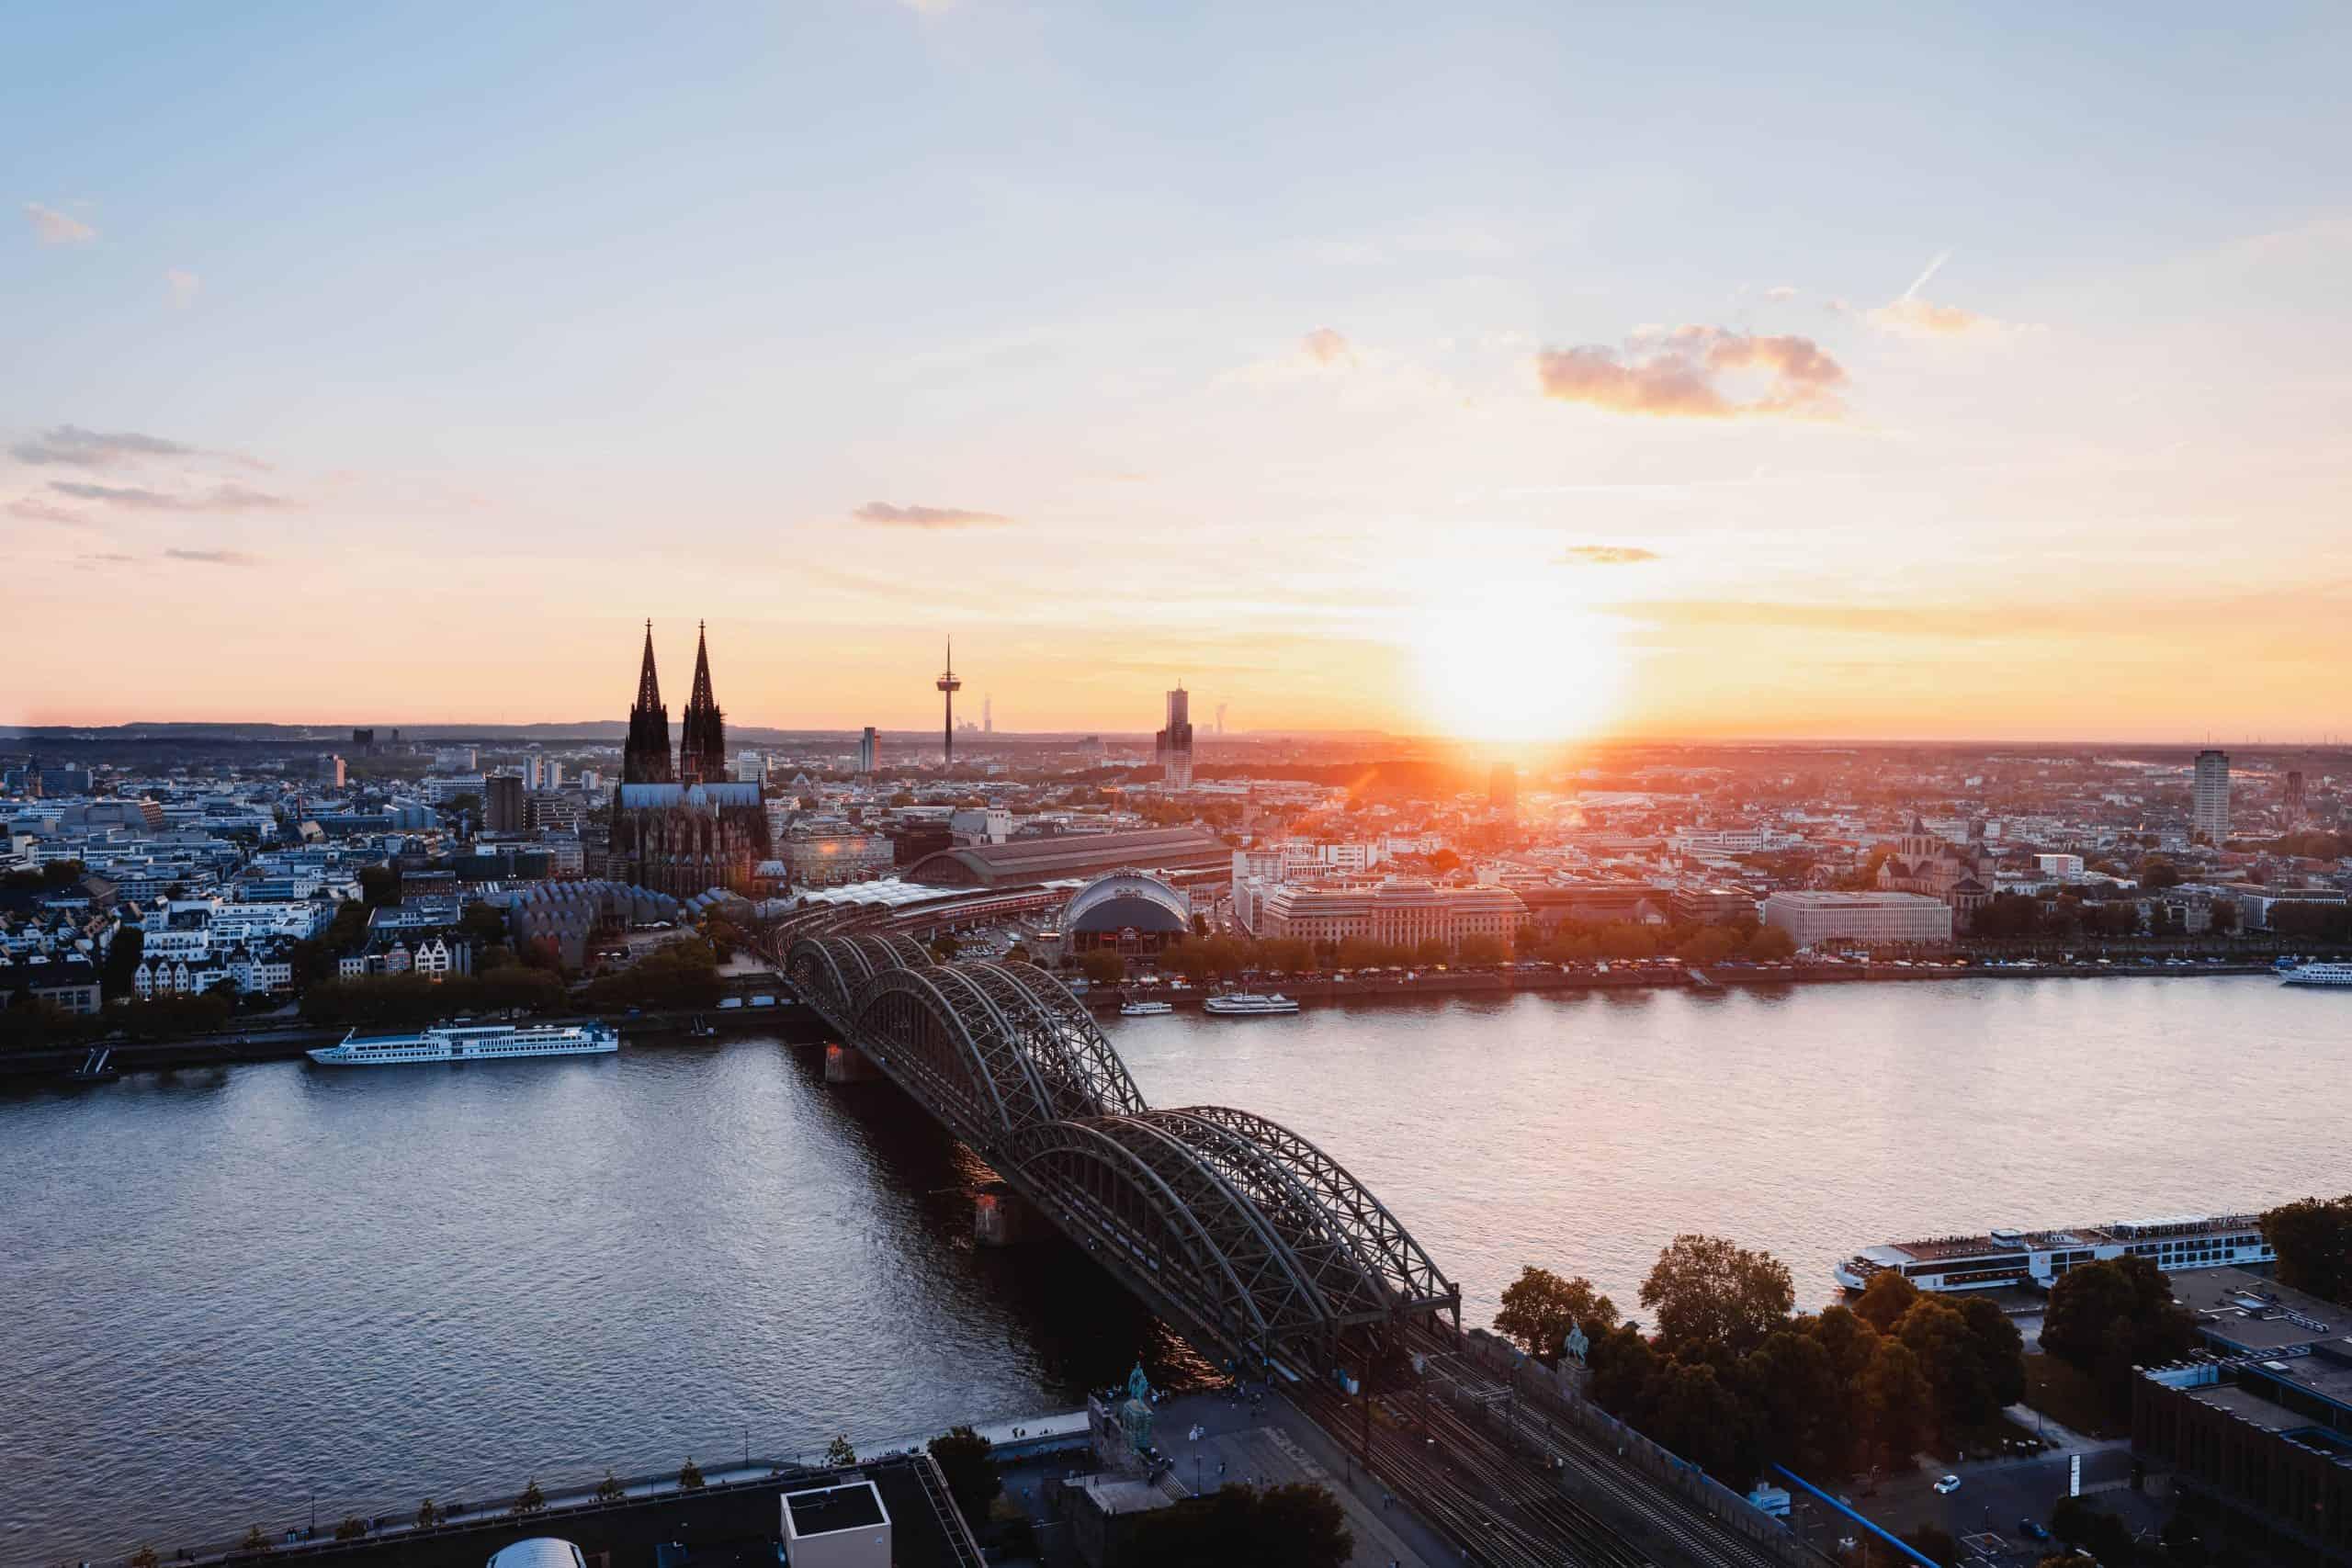 Kölner Immobilieninvestor engagiert sich bei Kerpener Distributionszentrum